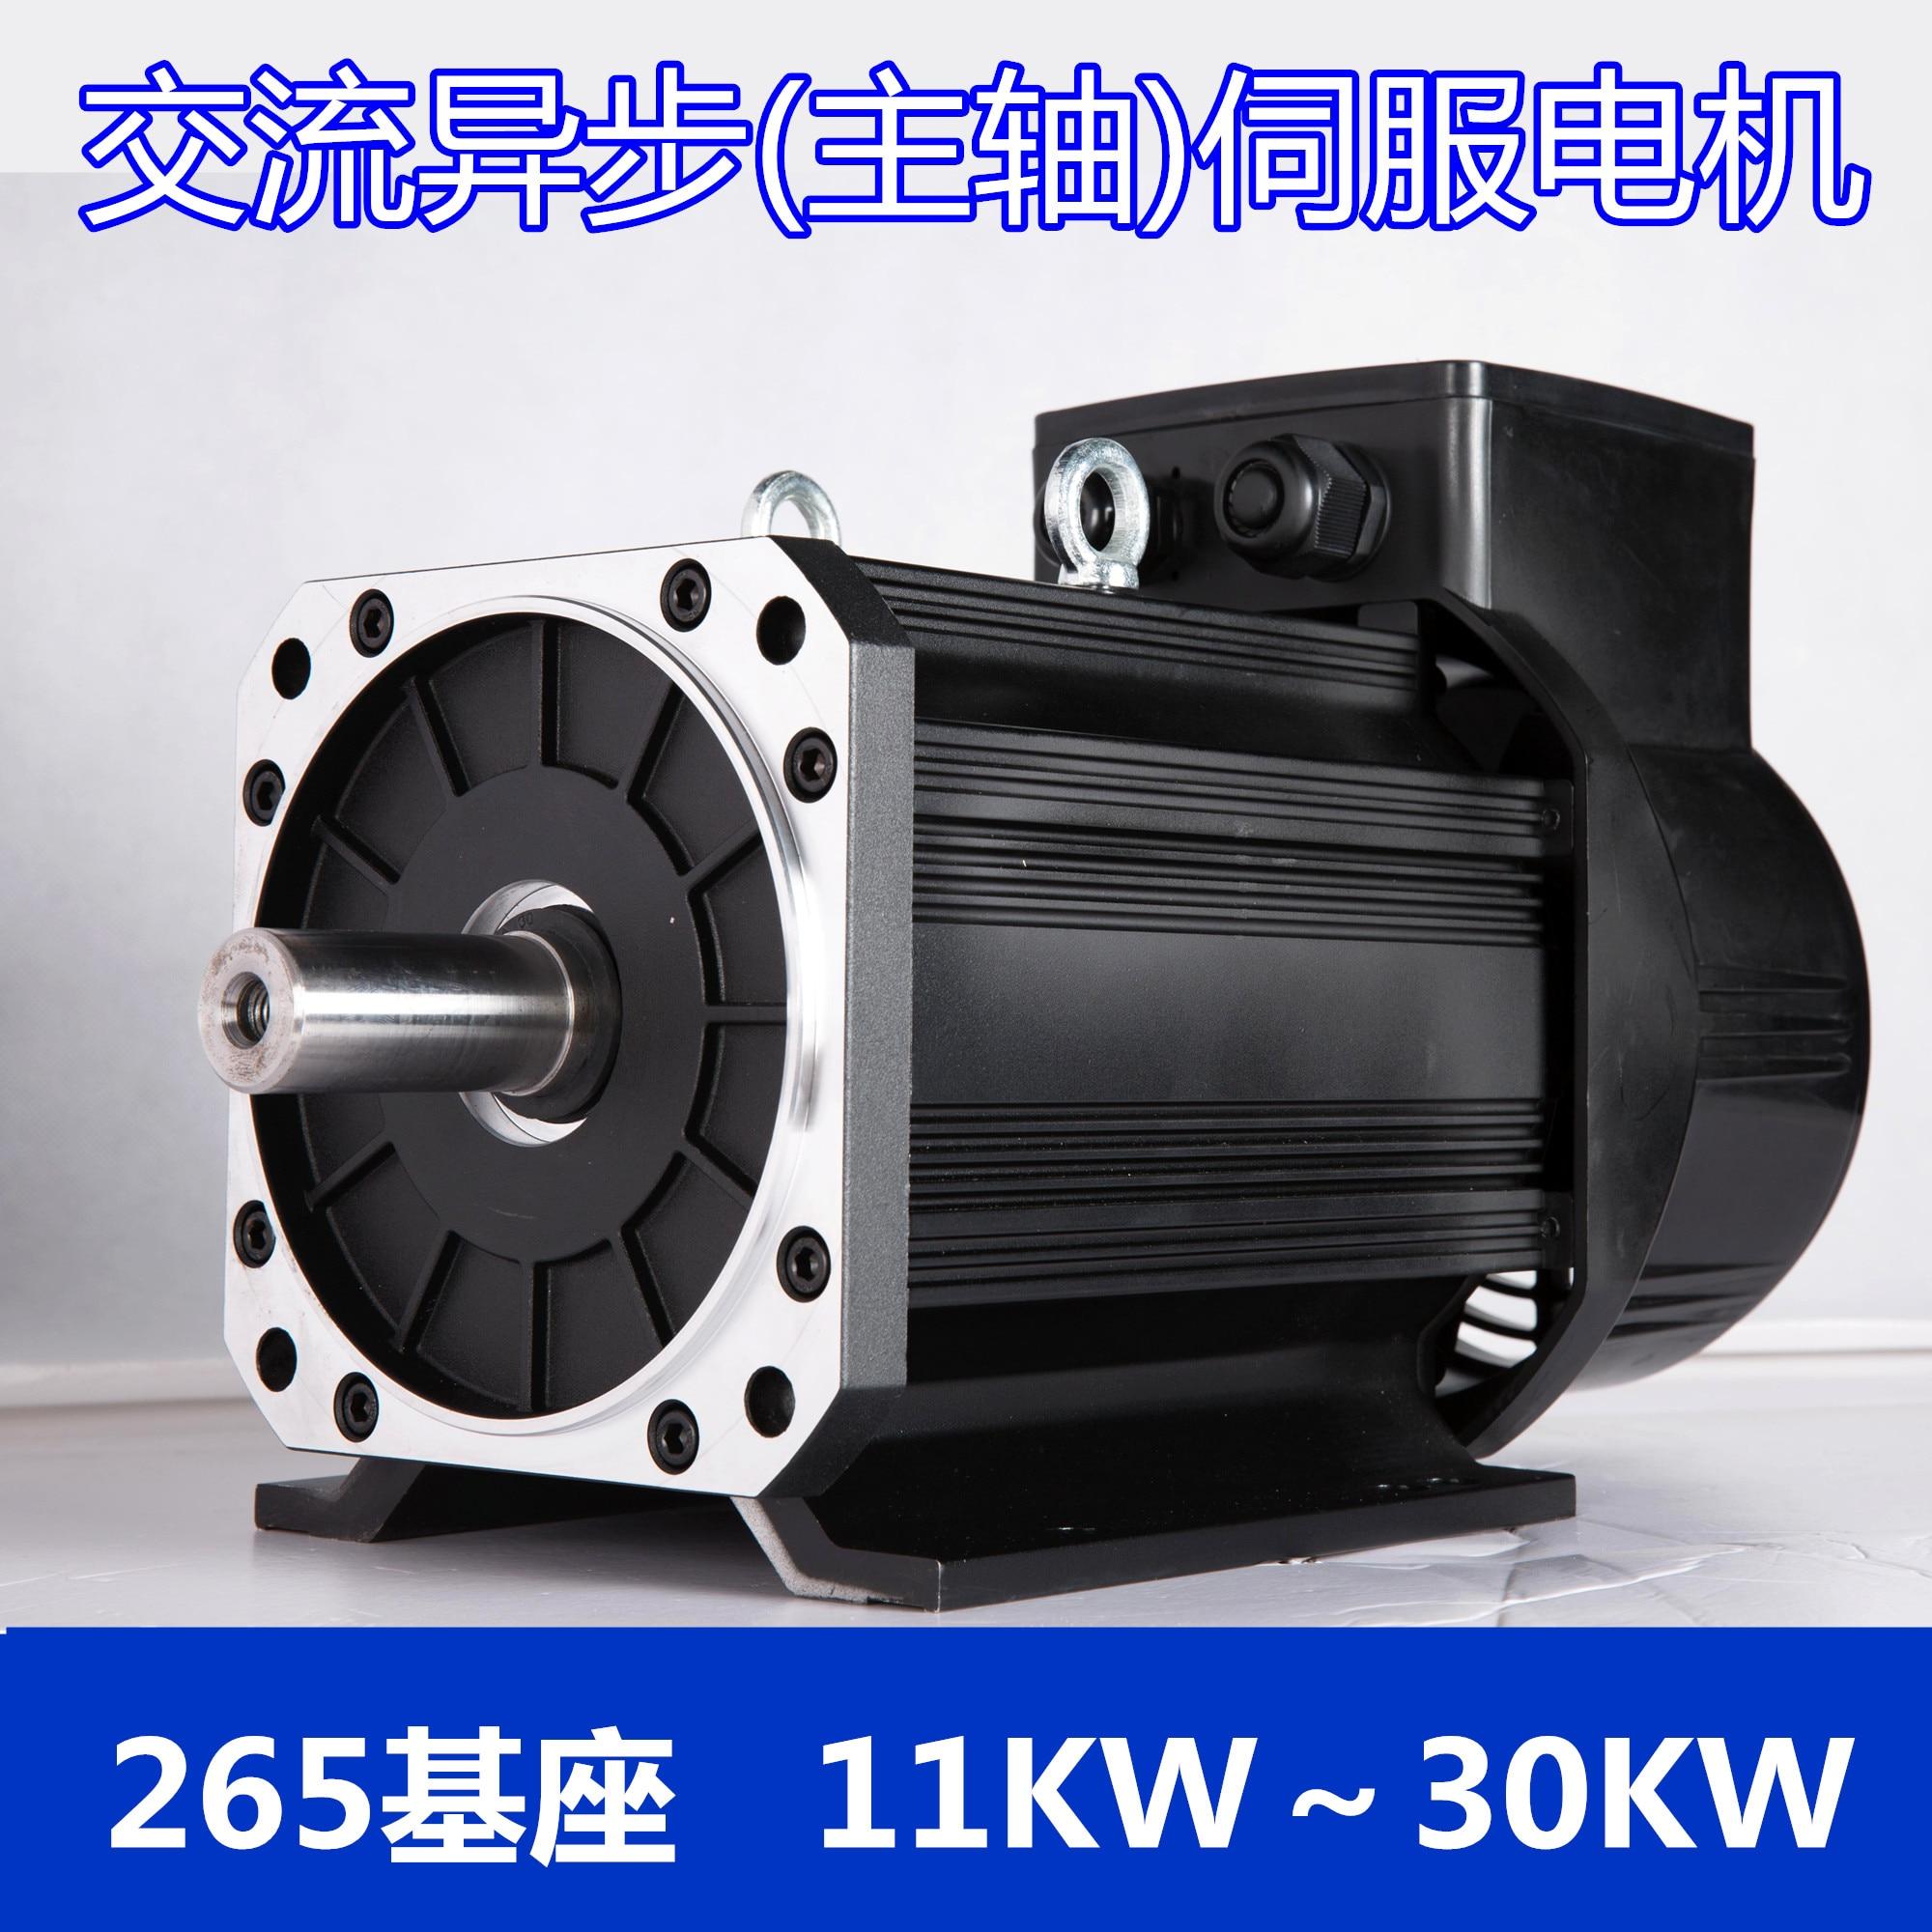 Motor servo husillo, base 264, 6000RPM, 11kW, 15kW, 18,5 kW, 22kW, 30kW